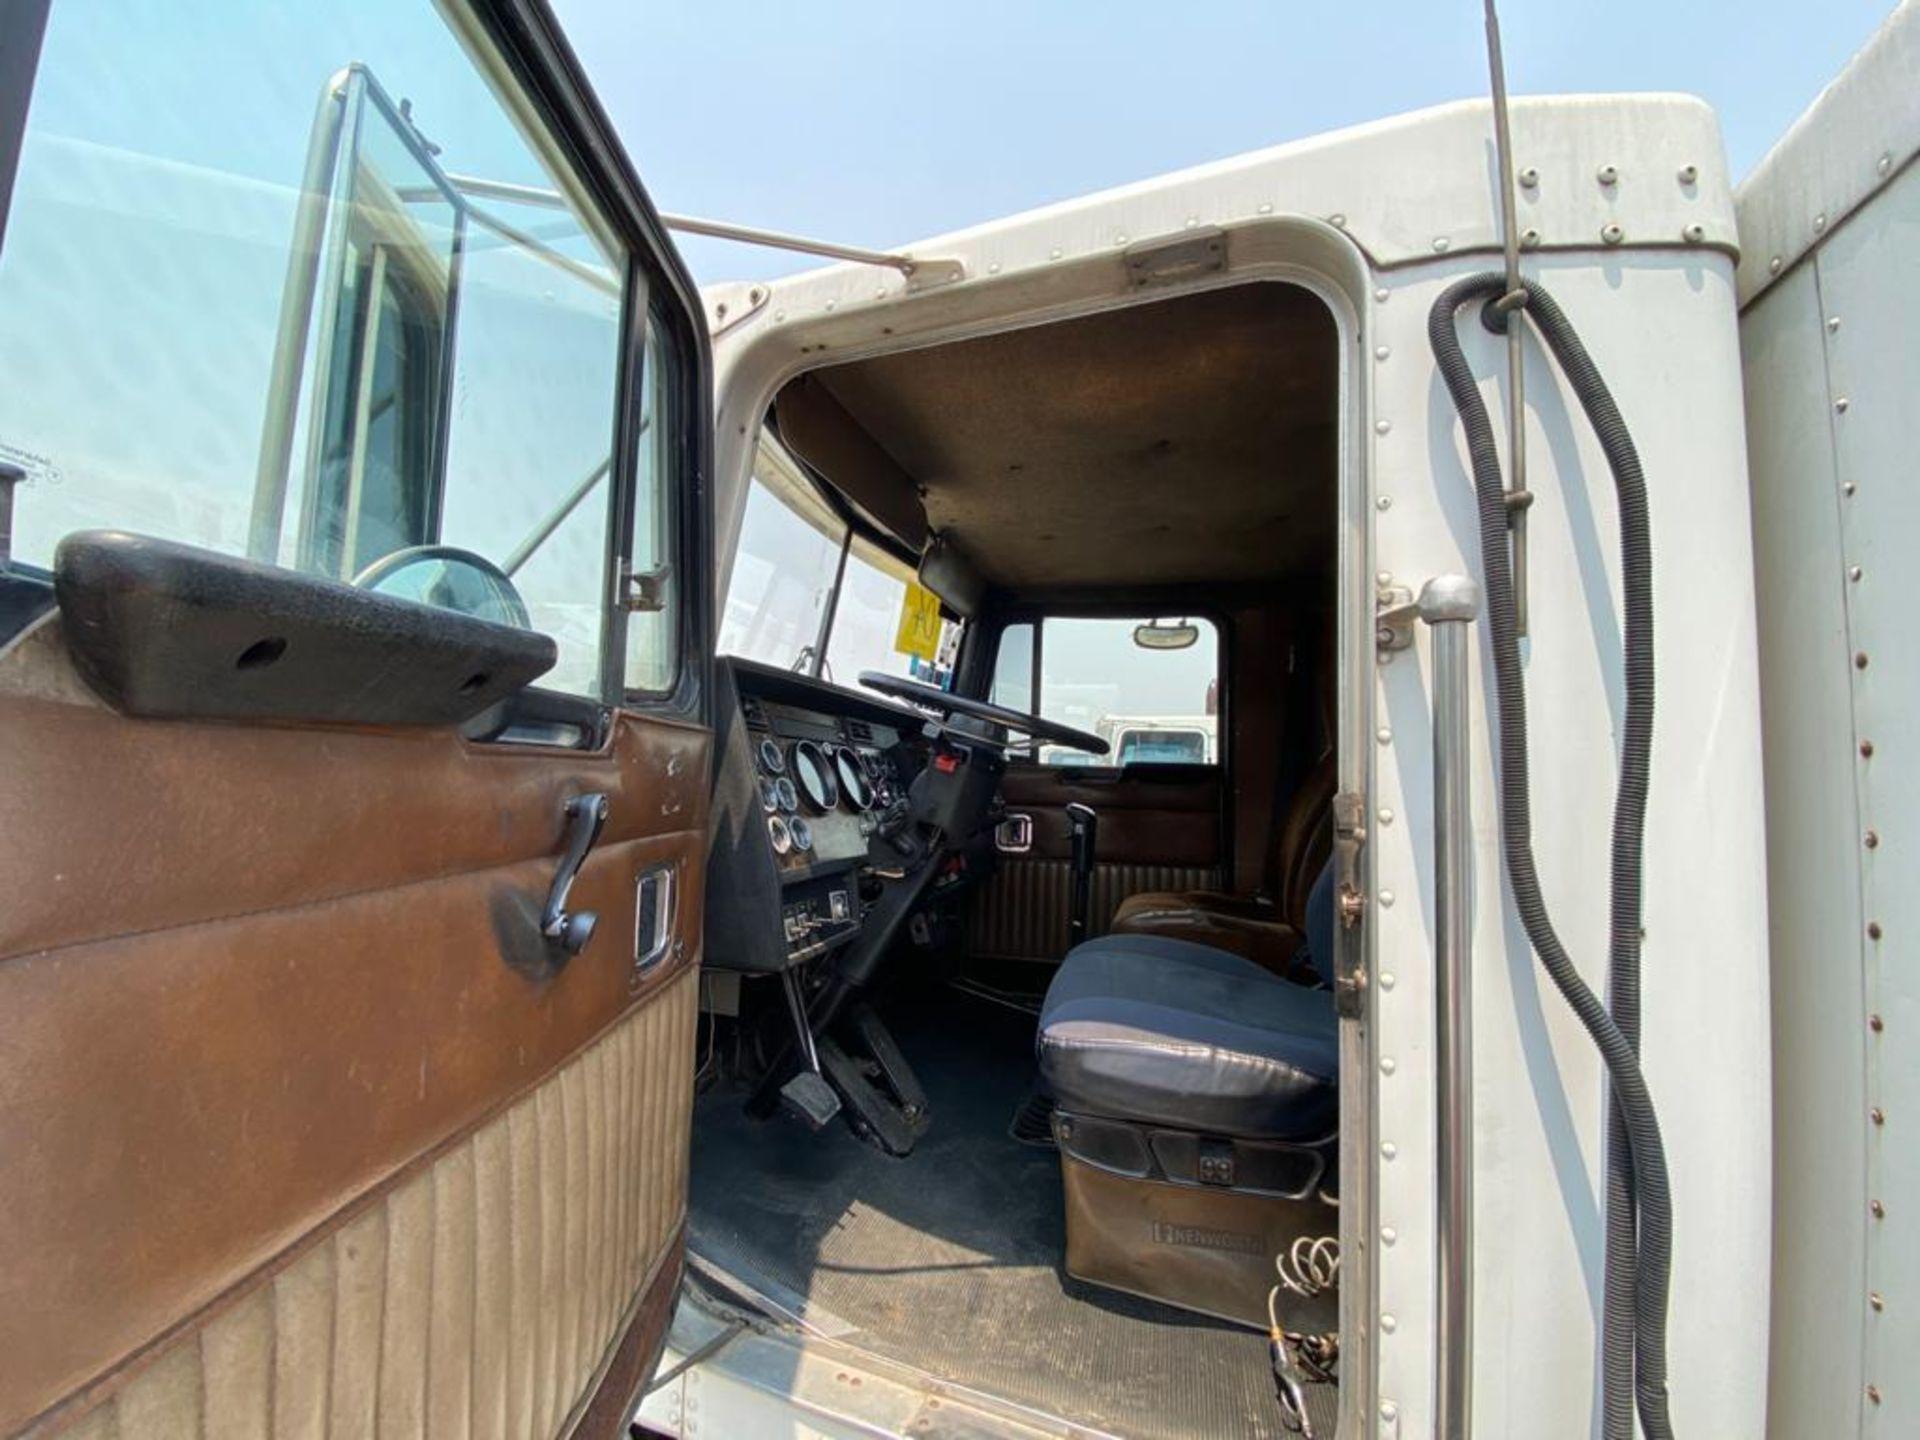 1999 Kenworth Sleeper truck tractor, standard transmission of 18 speeds - Image 47 of 70